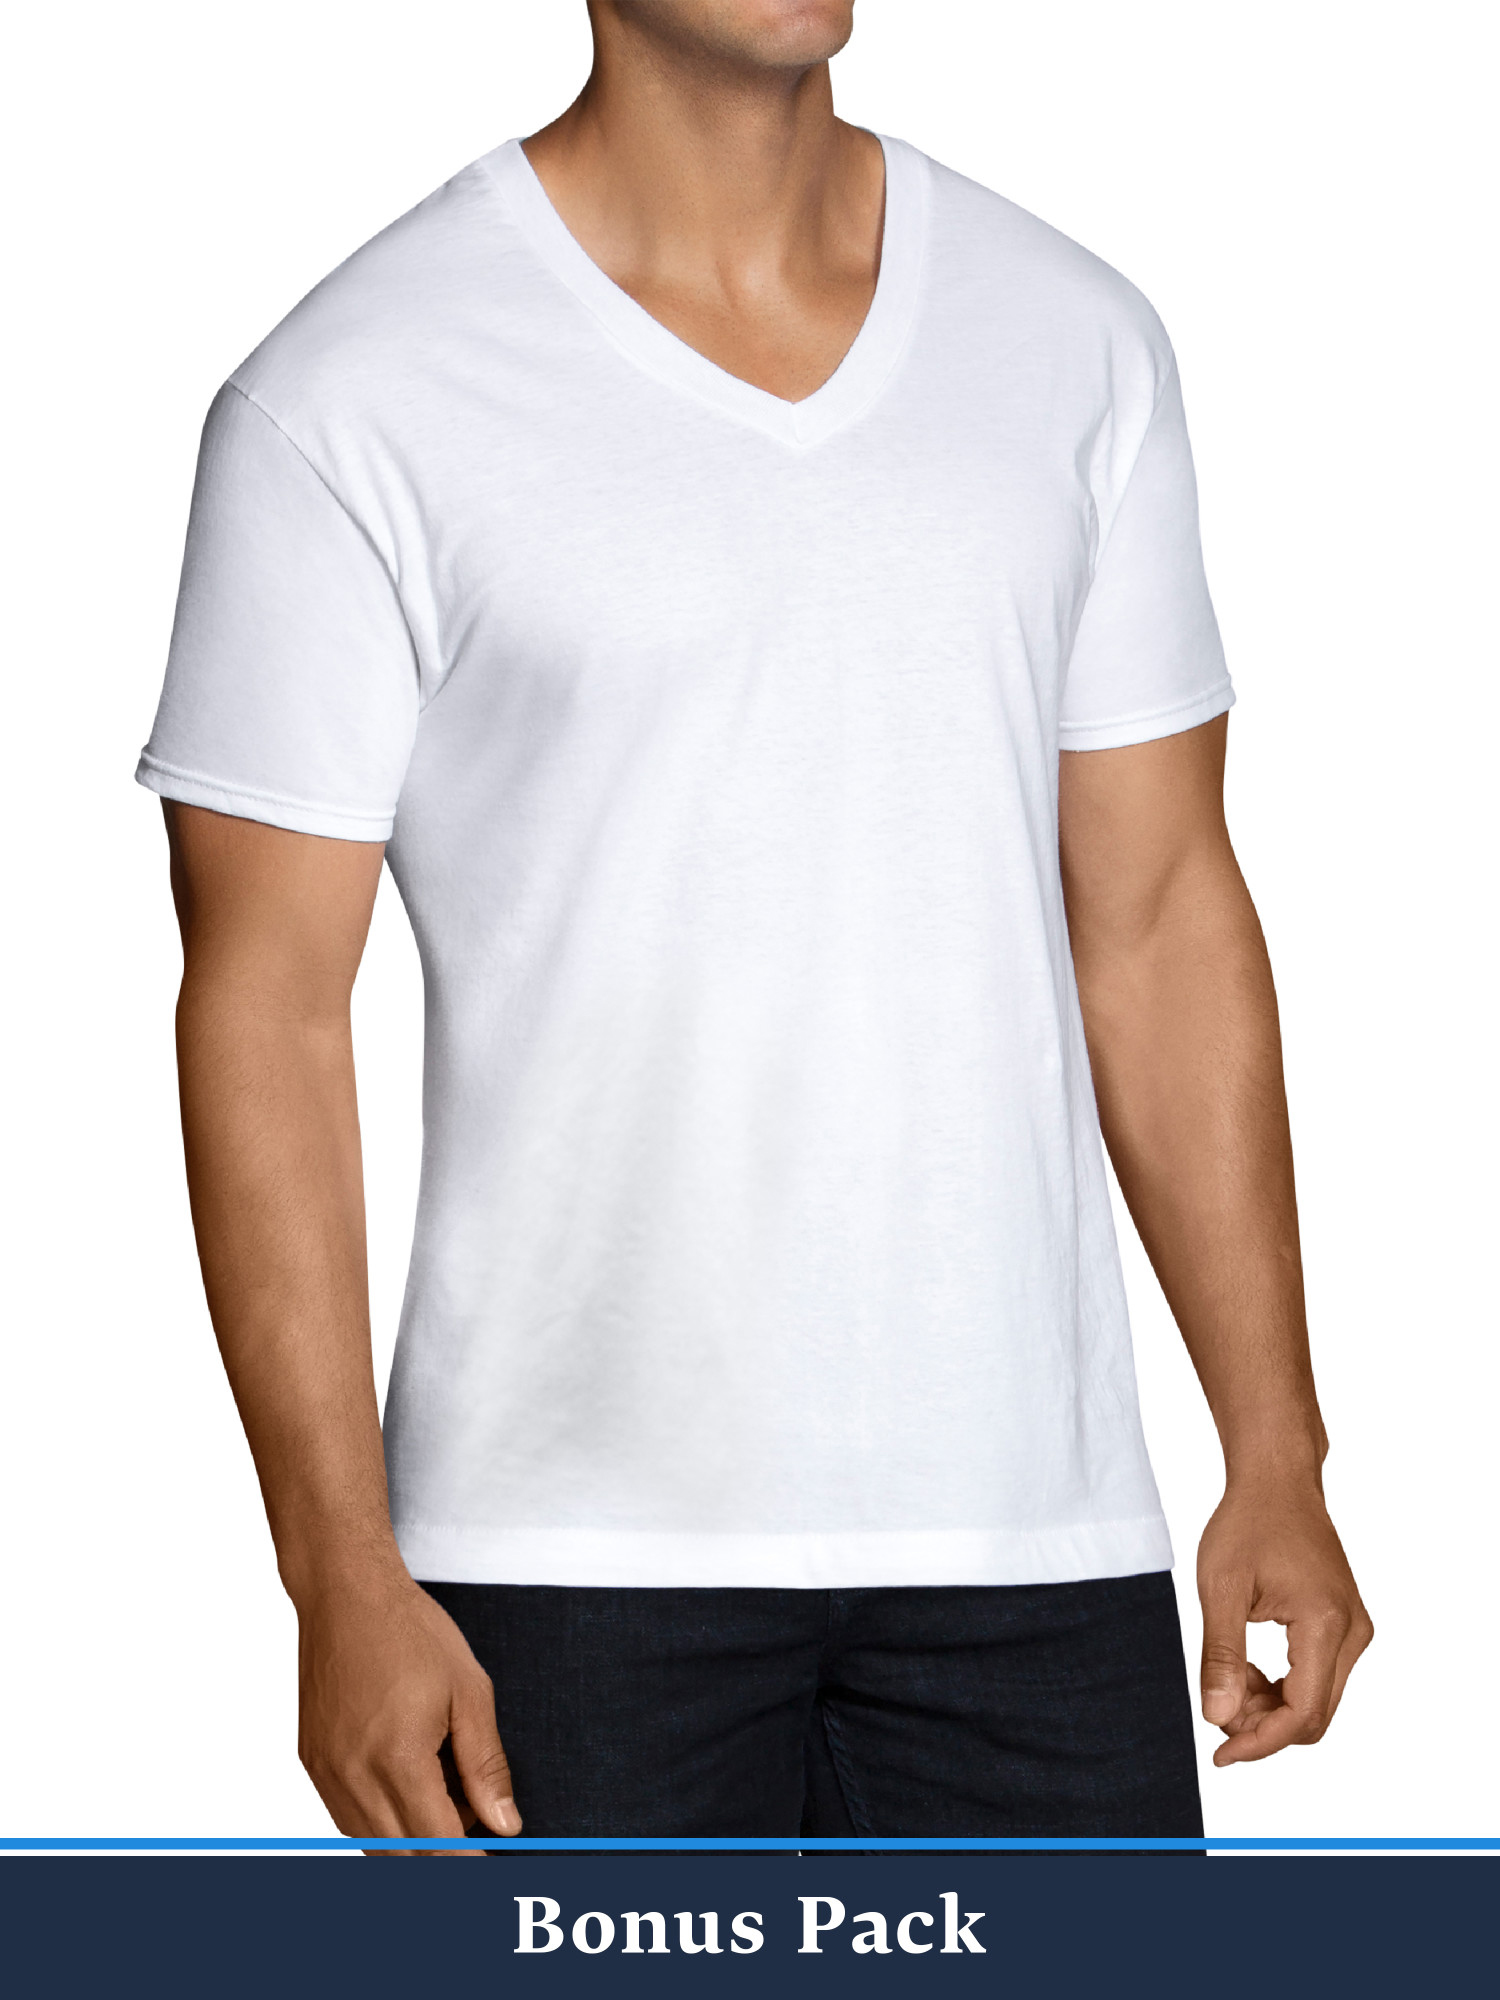 9337f798ea Fruit of the Loom Men's Dual Defense White V-Neck T-Shirts, 6+6 ...